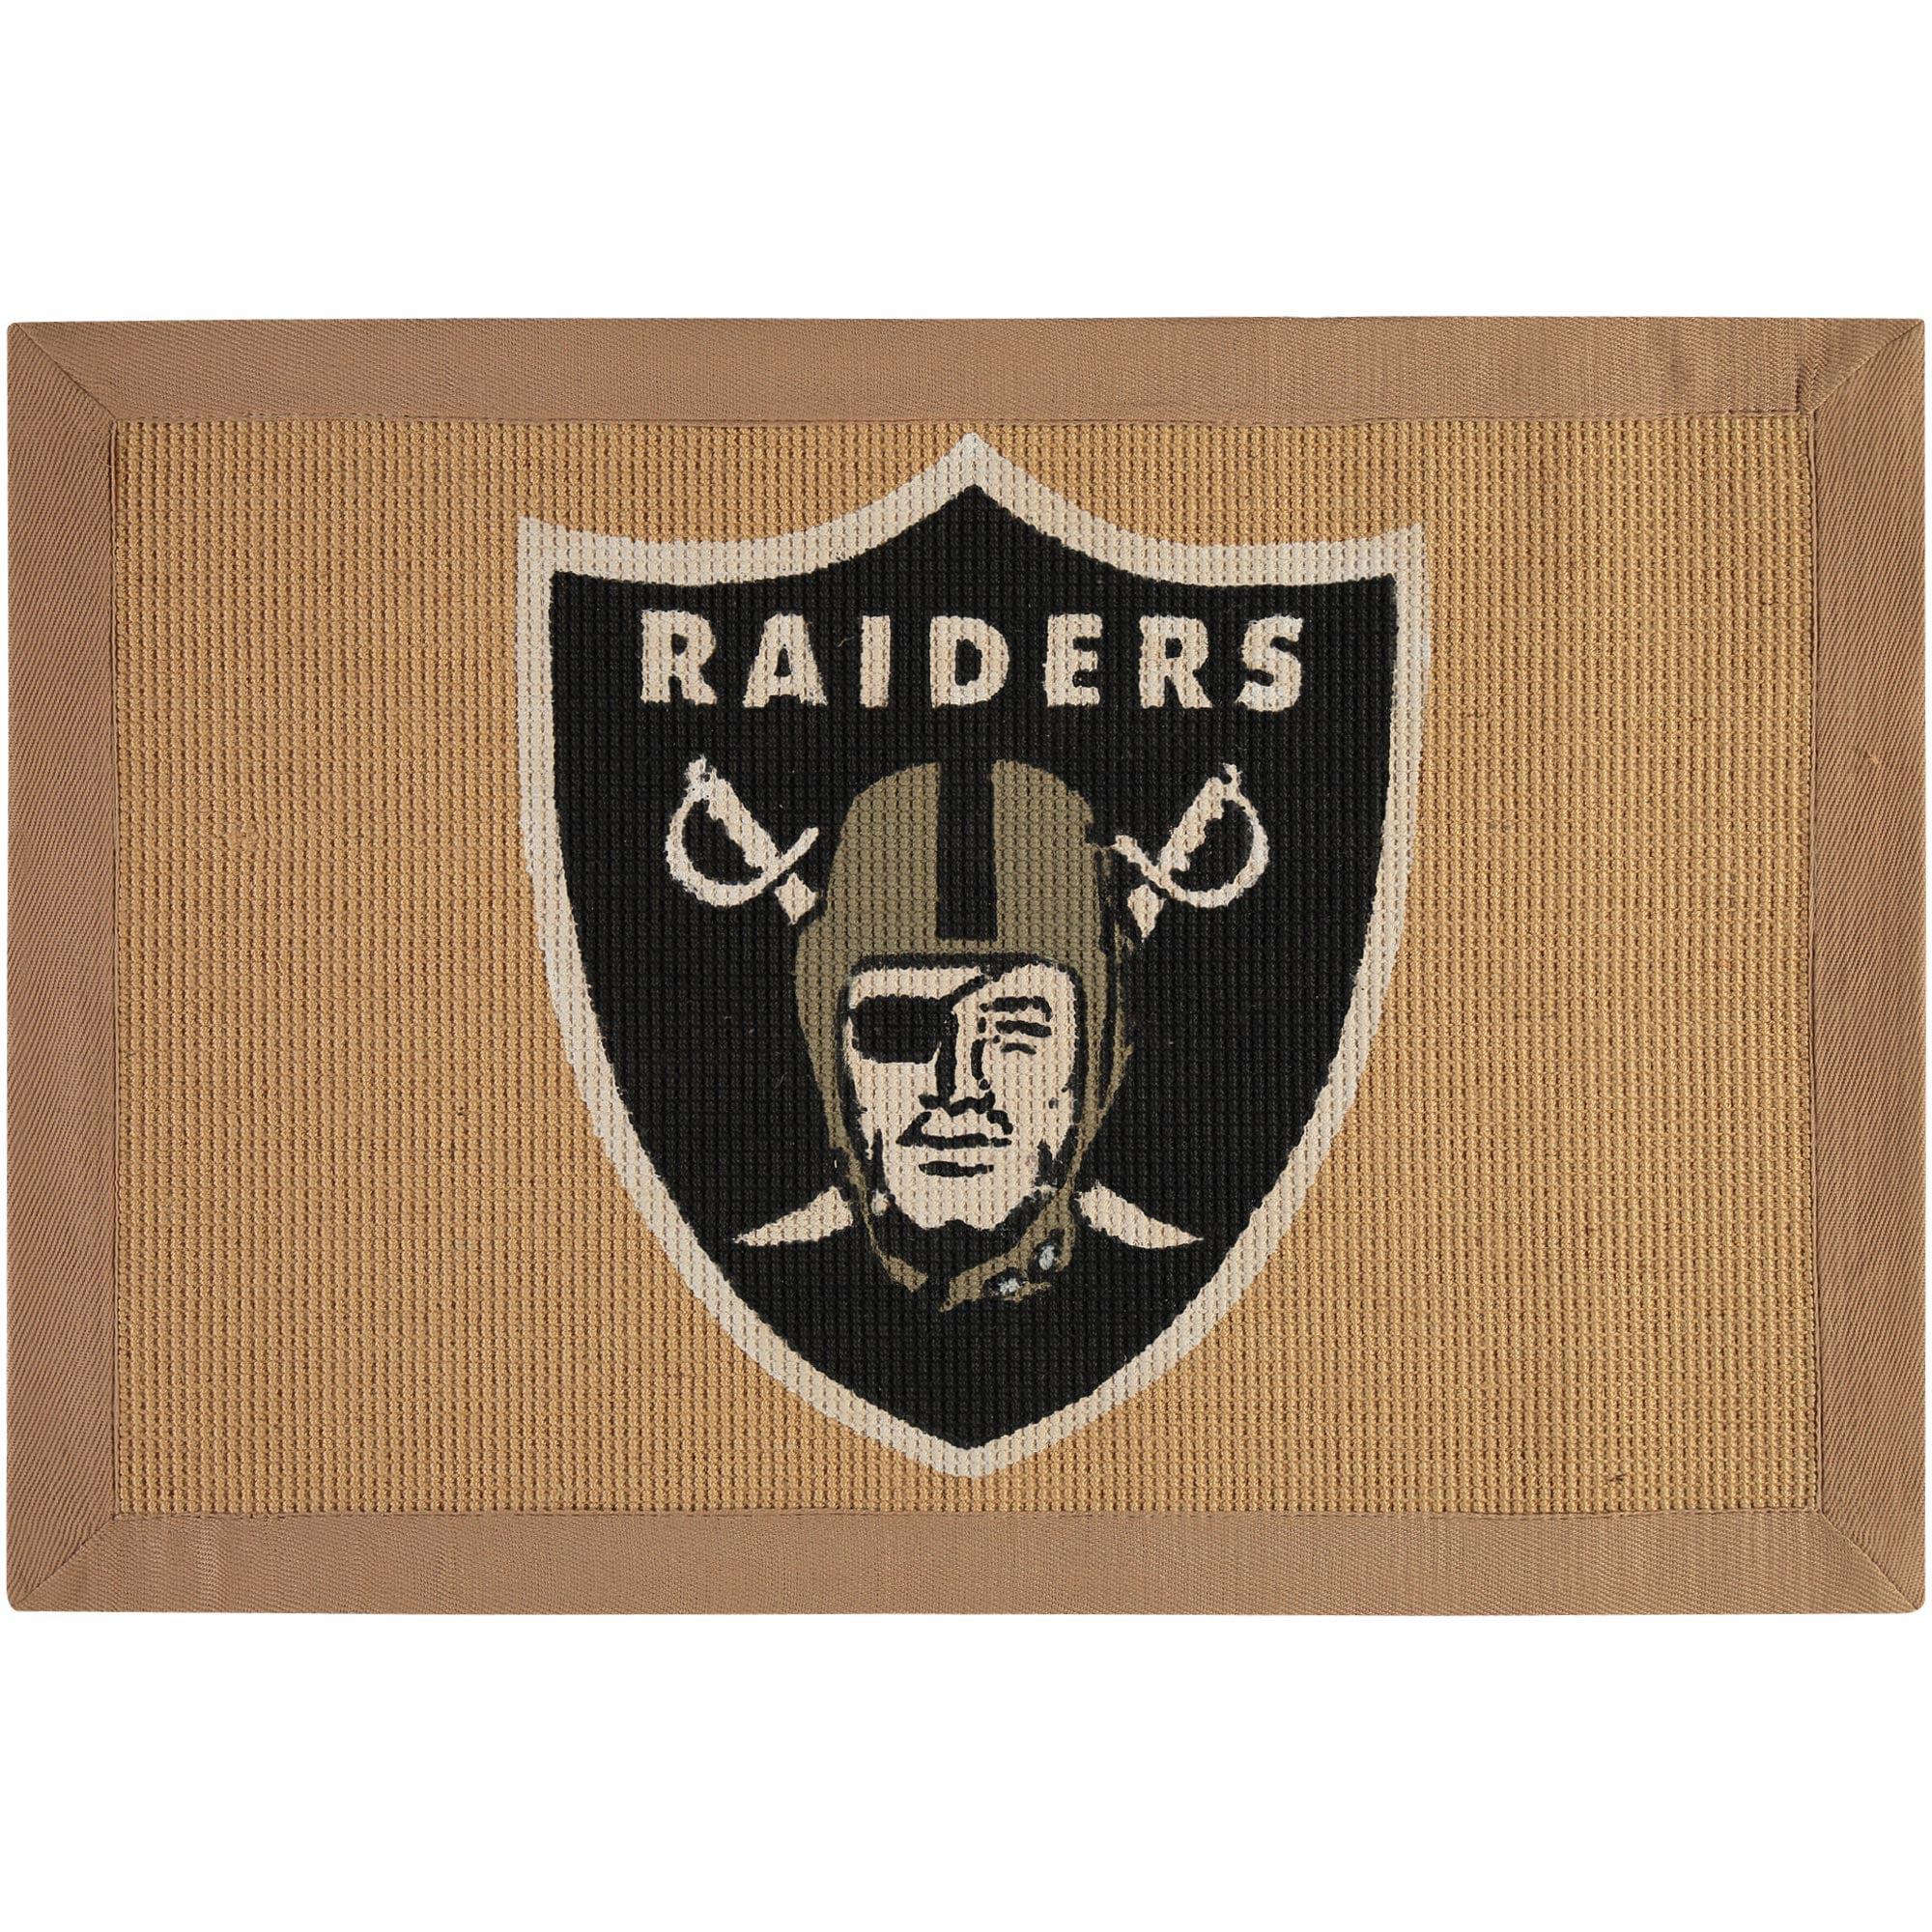 Oakland Raiders Jute Rug - No Size